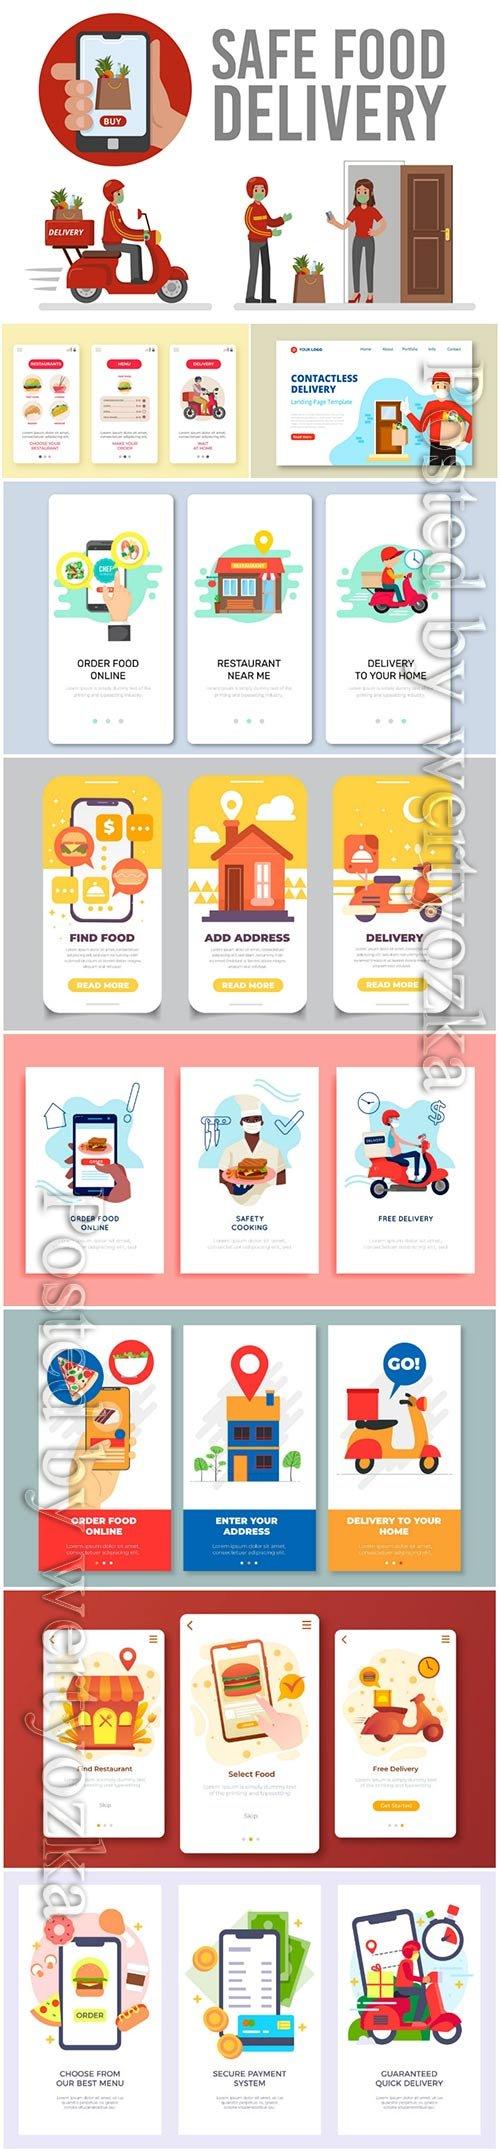 Food delivery app onboarding screens vector